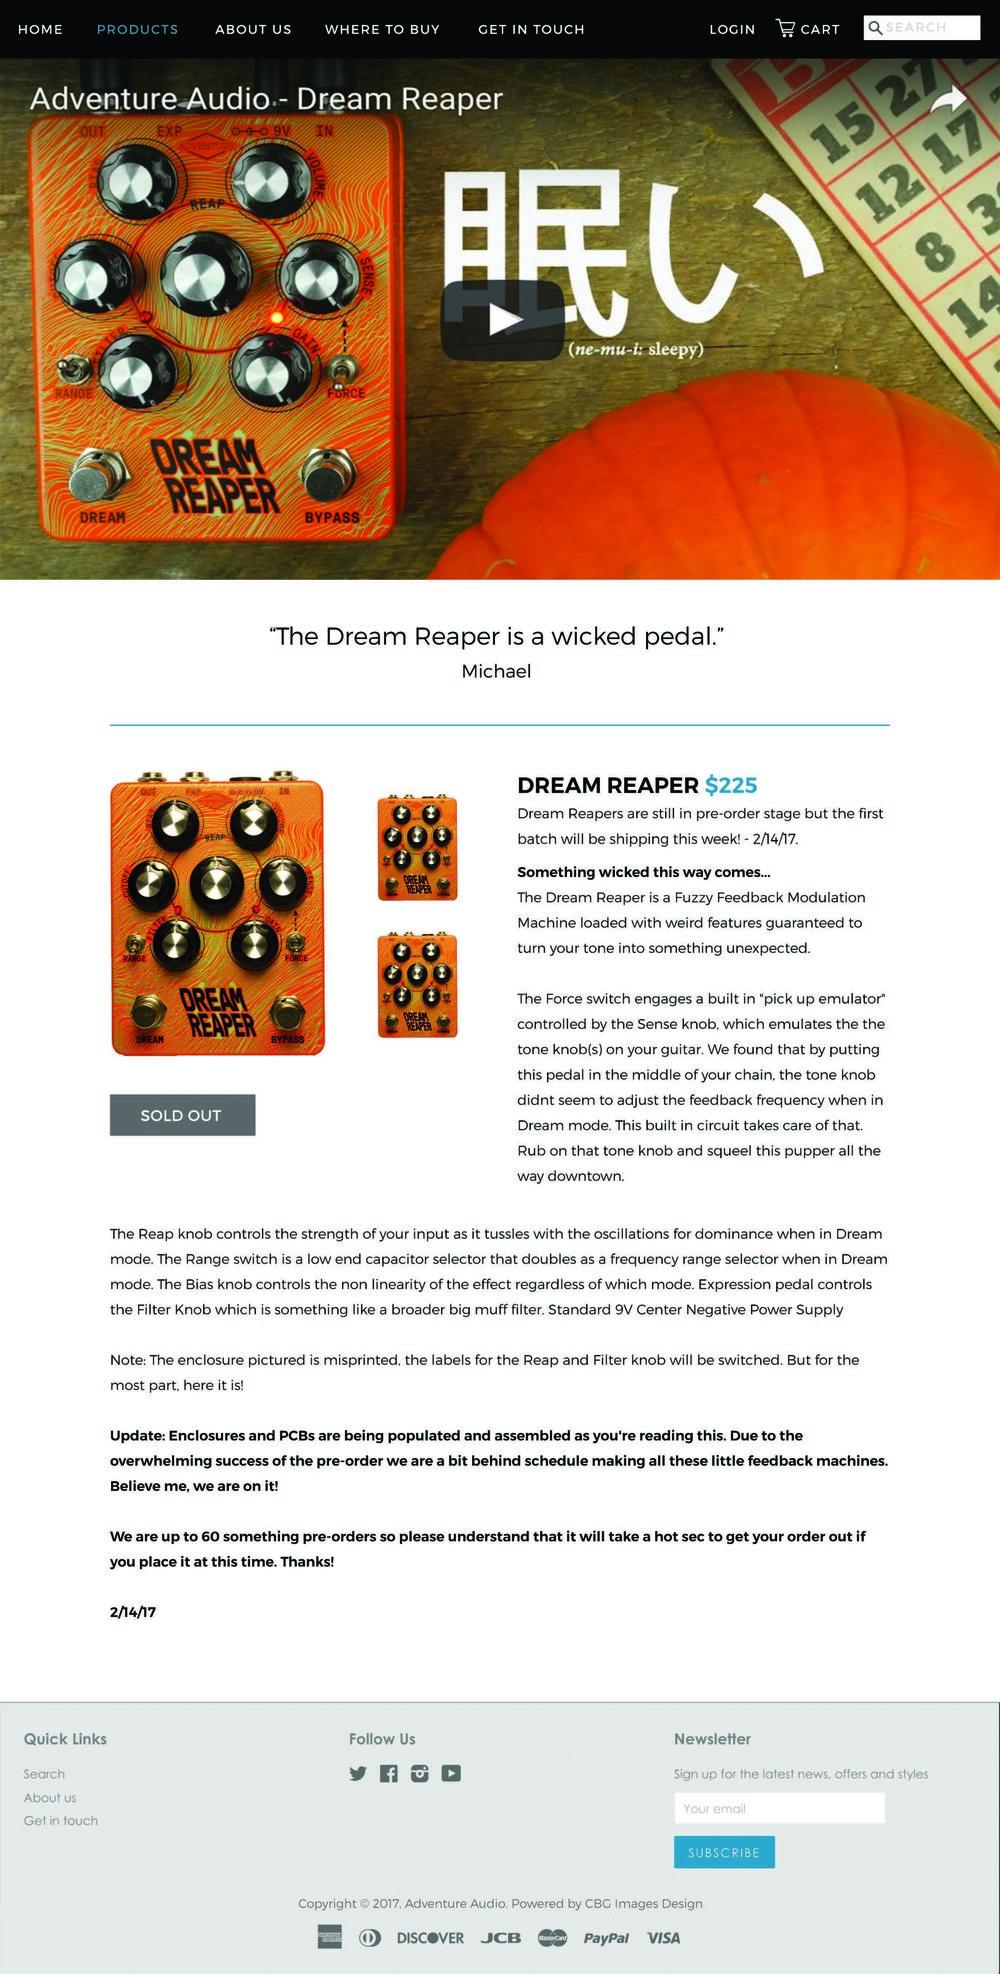 Adventure Audio_UIUX_Product Page_Dream Reaper.jpg